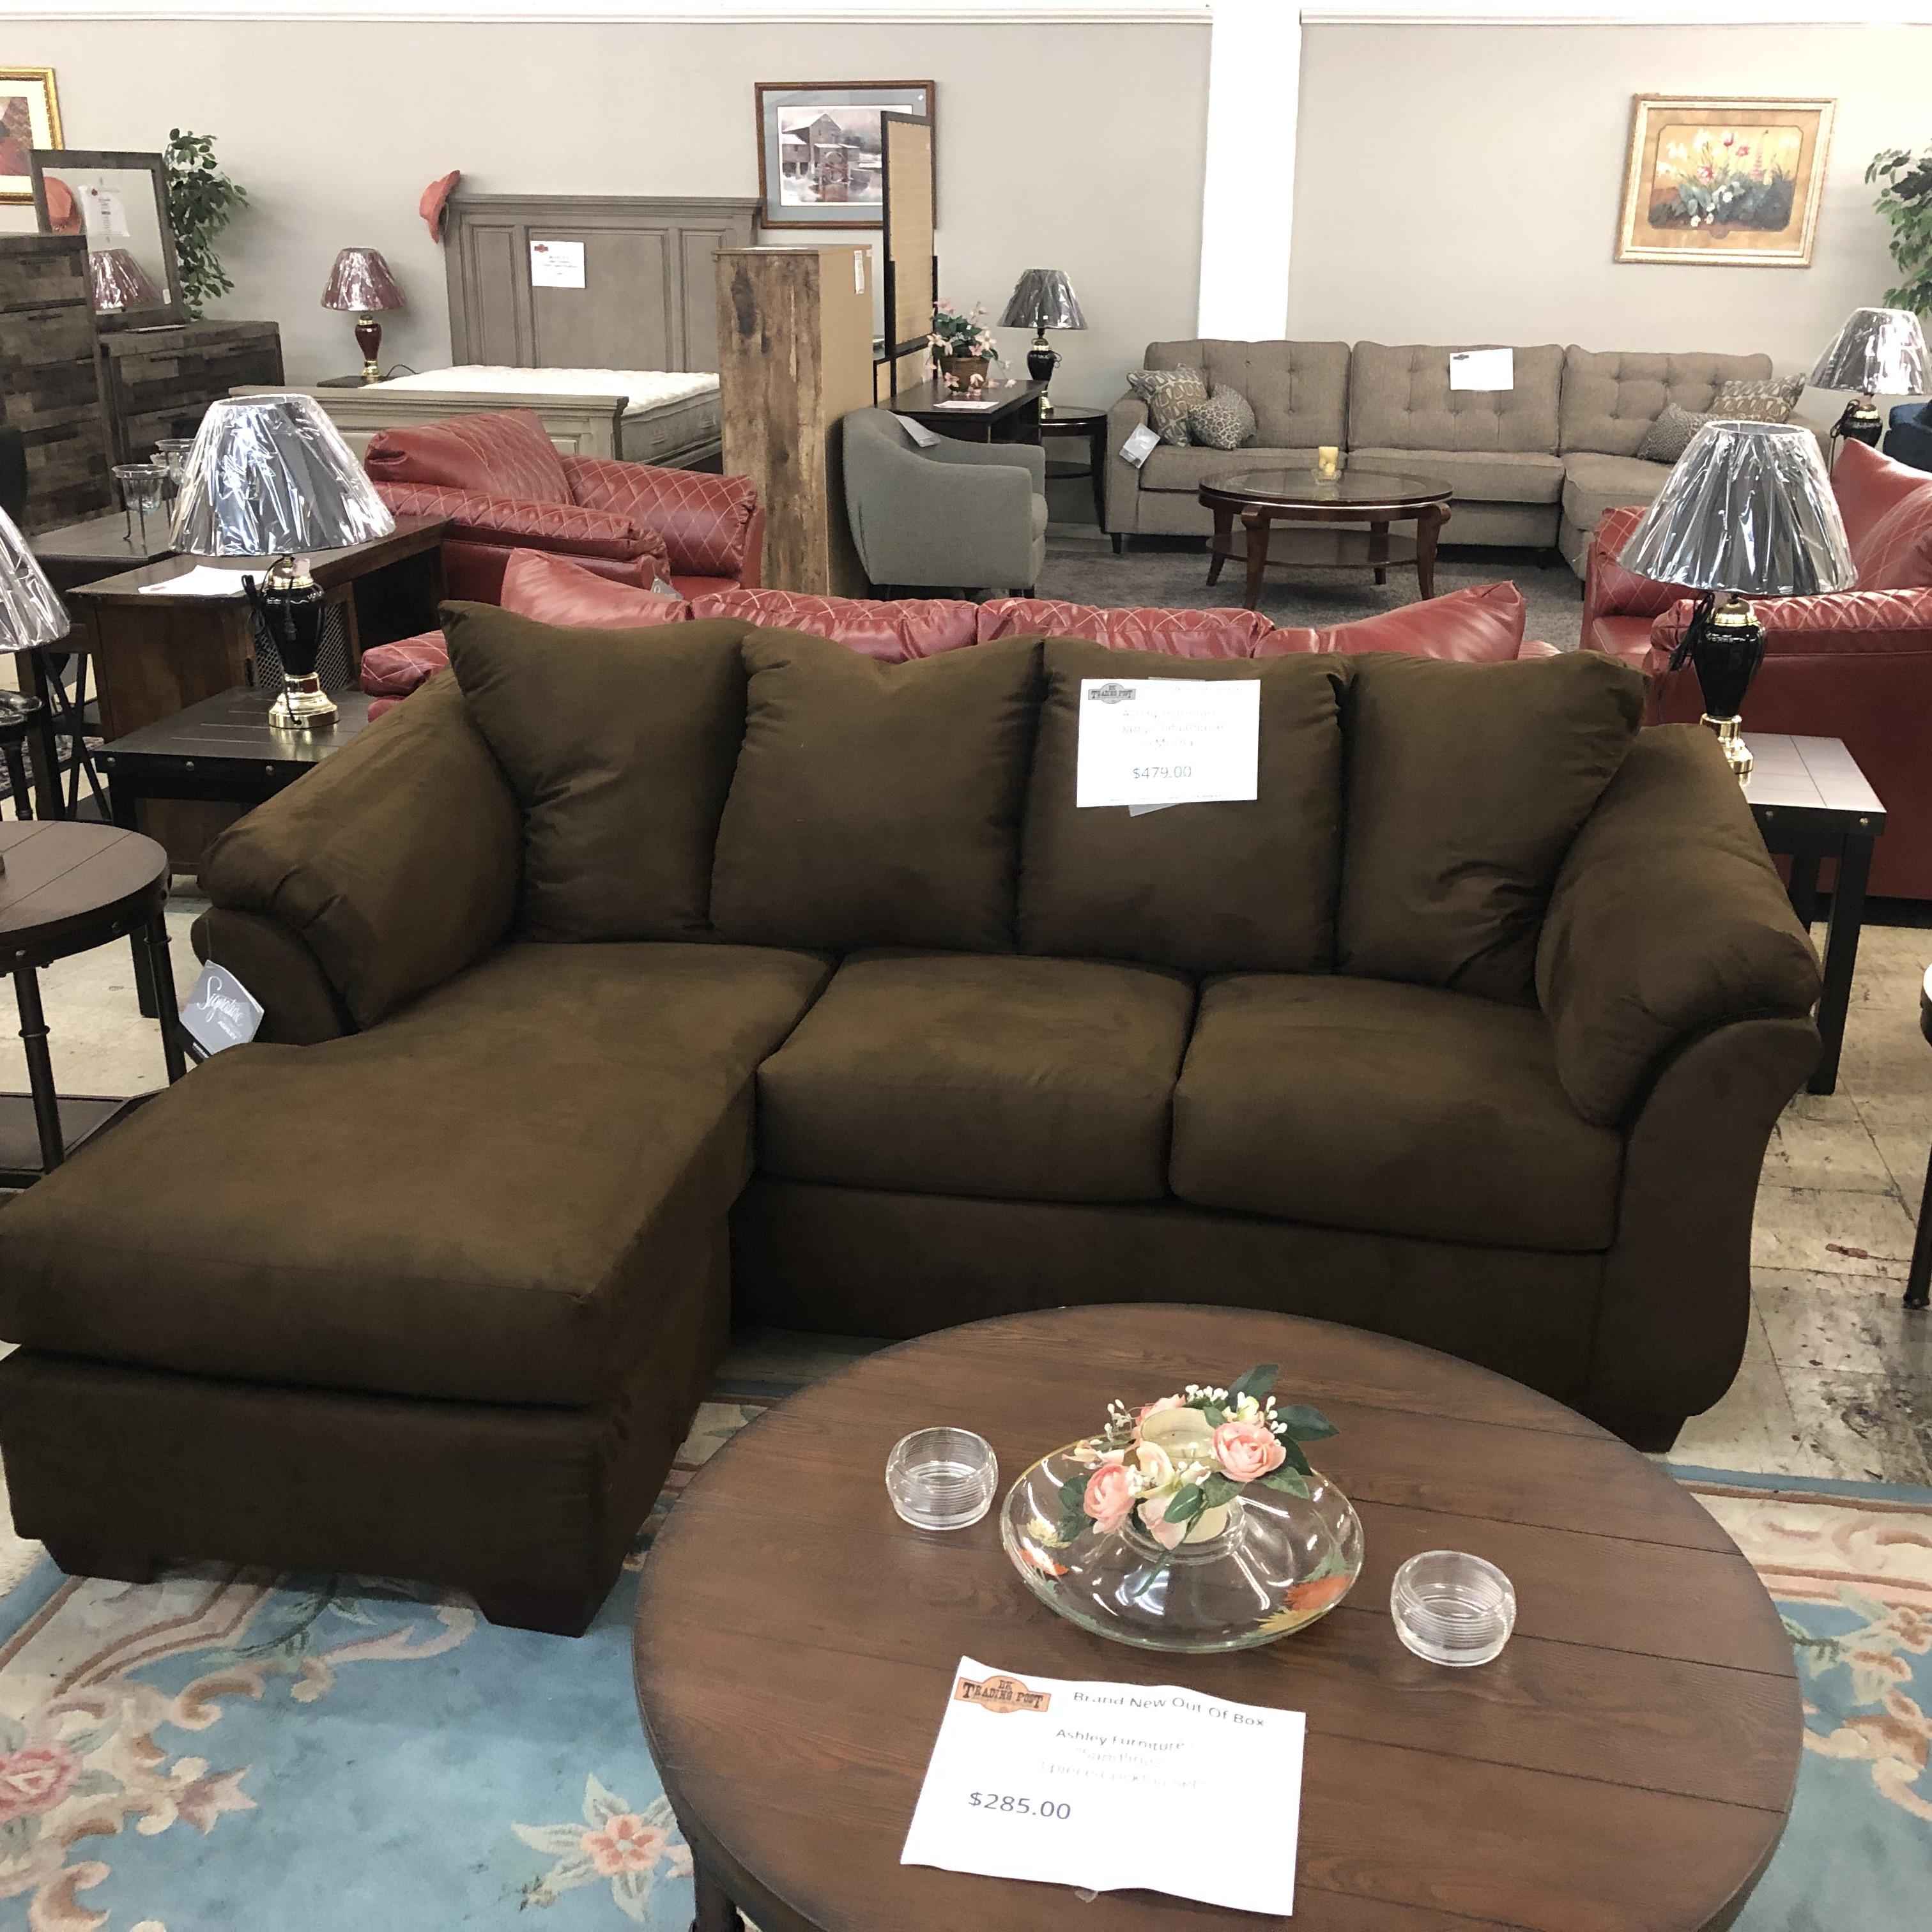 Amazing Living Room Brand New Ashley Darcy Sofa Chaise In Mocha Dailytribune Chair Design For Home Dailytribuneorg